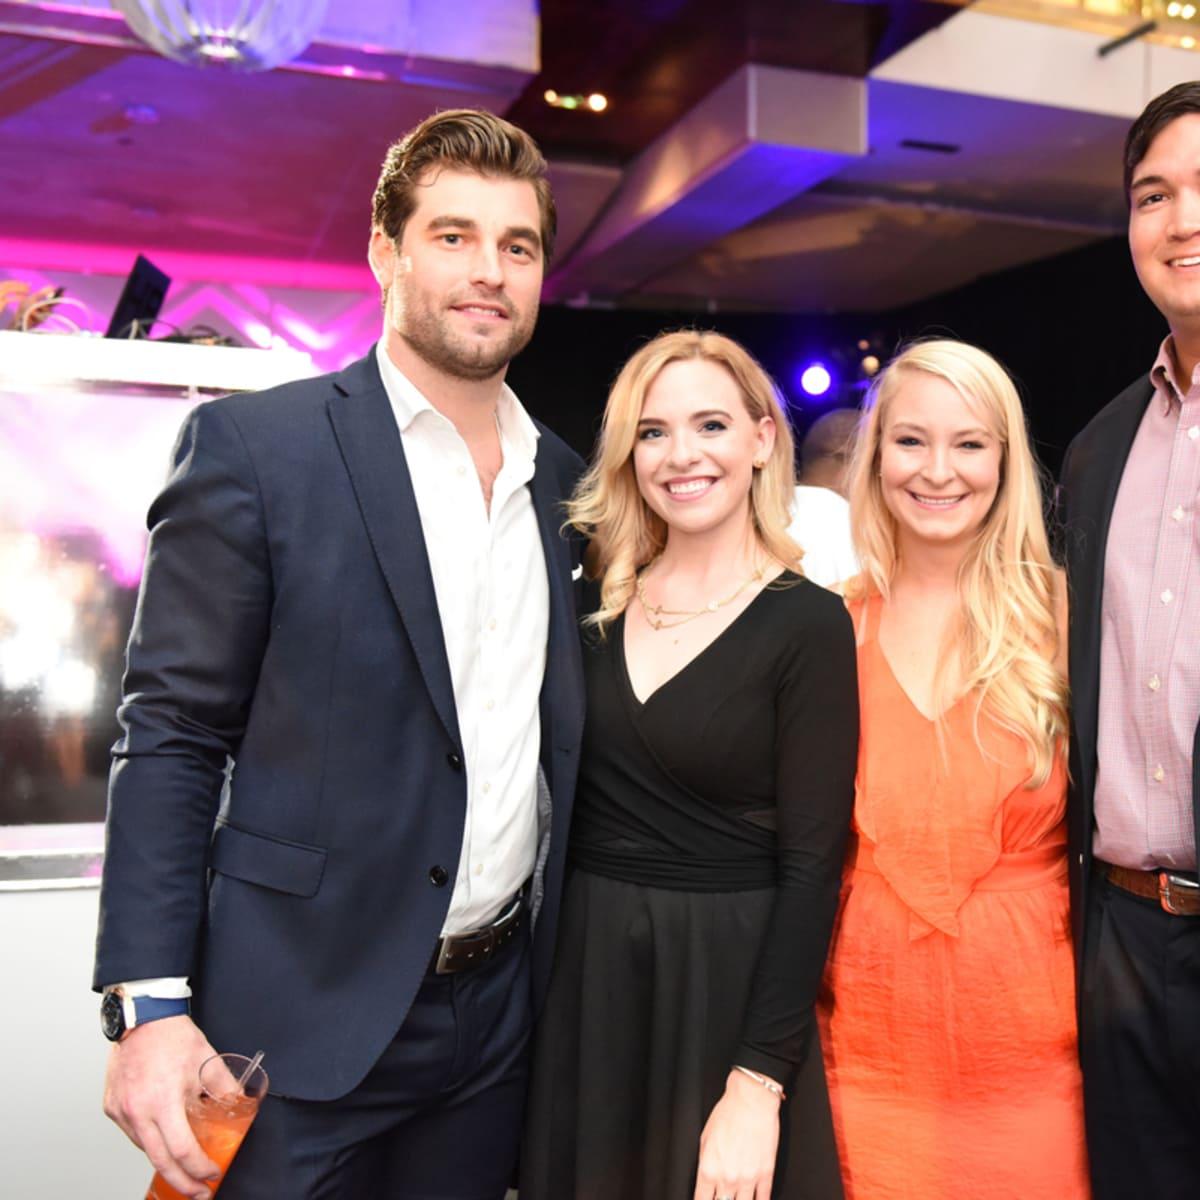 Houston, Vogue Simon Fashion Show, September 2015, Joshua Powell, Kate McNamee, Lauren Fallout, Ethan Welch